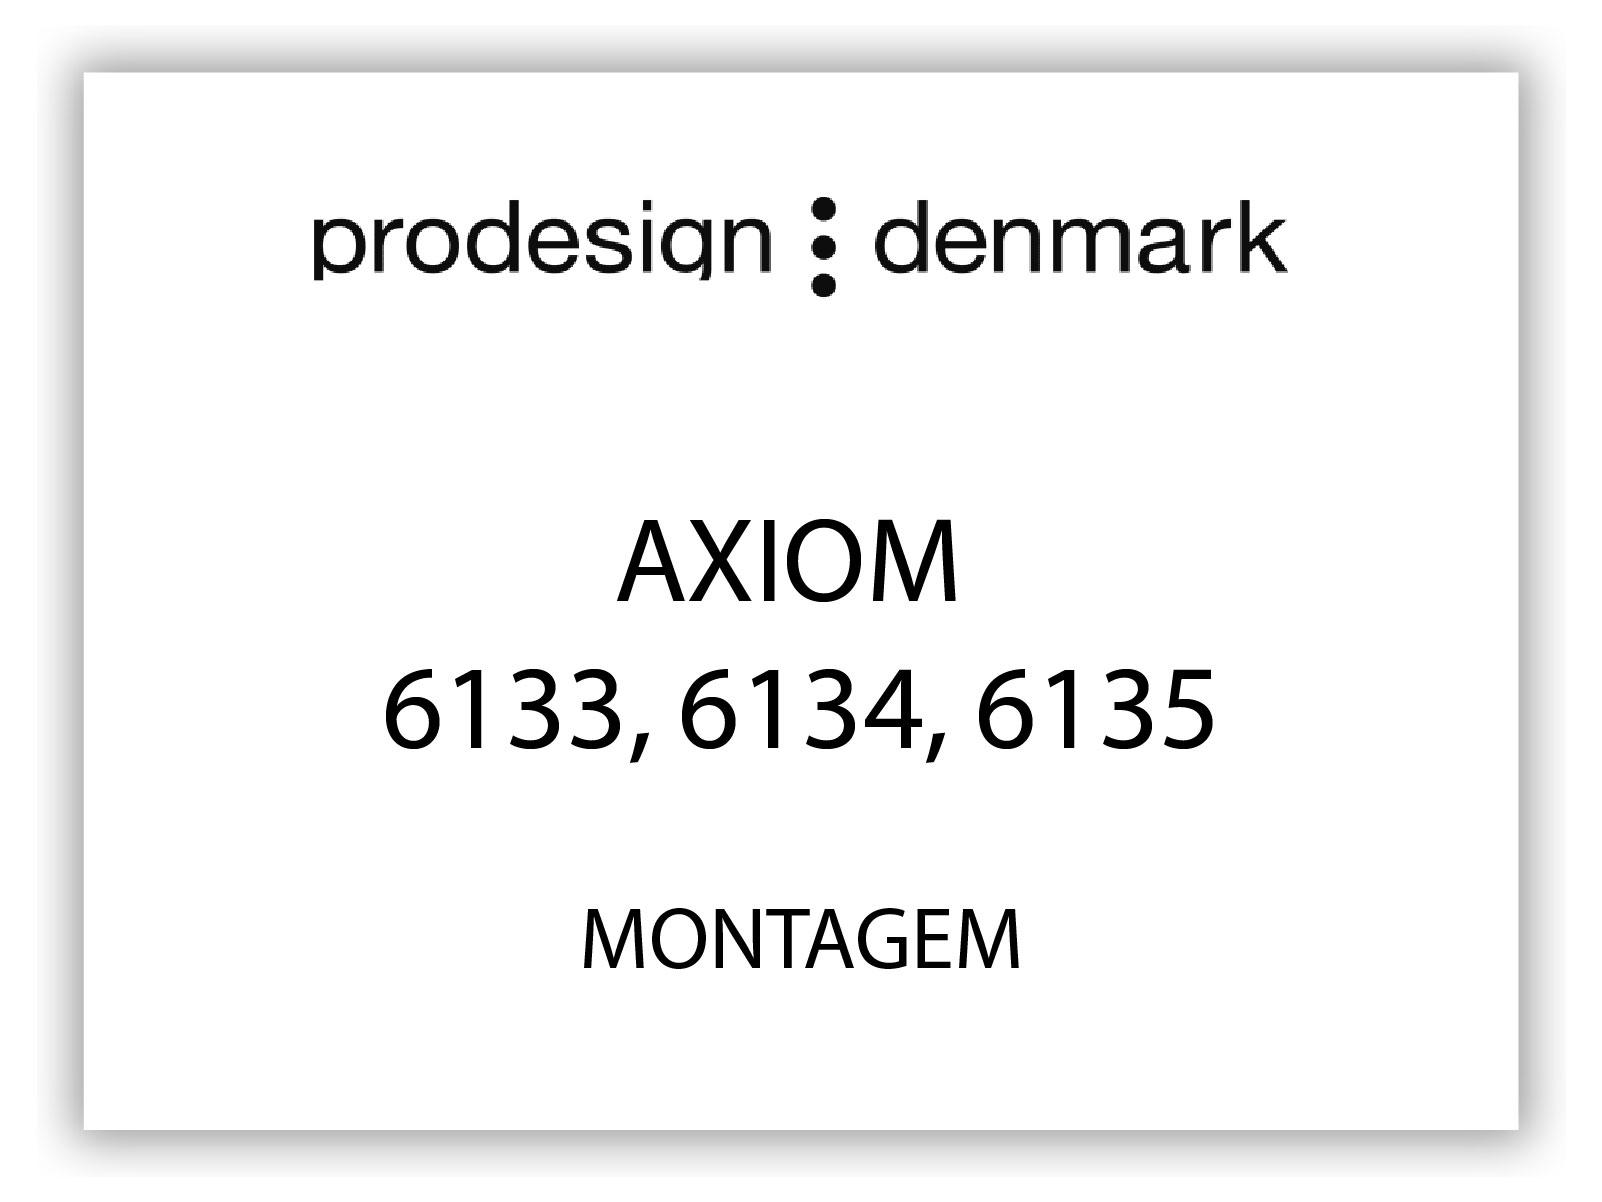 ProDesignDenamark_capa-AXIOM 6133, 6134, 6135-MONT